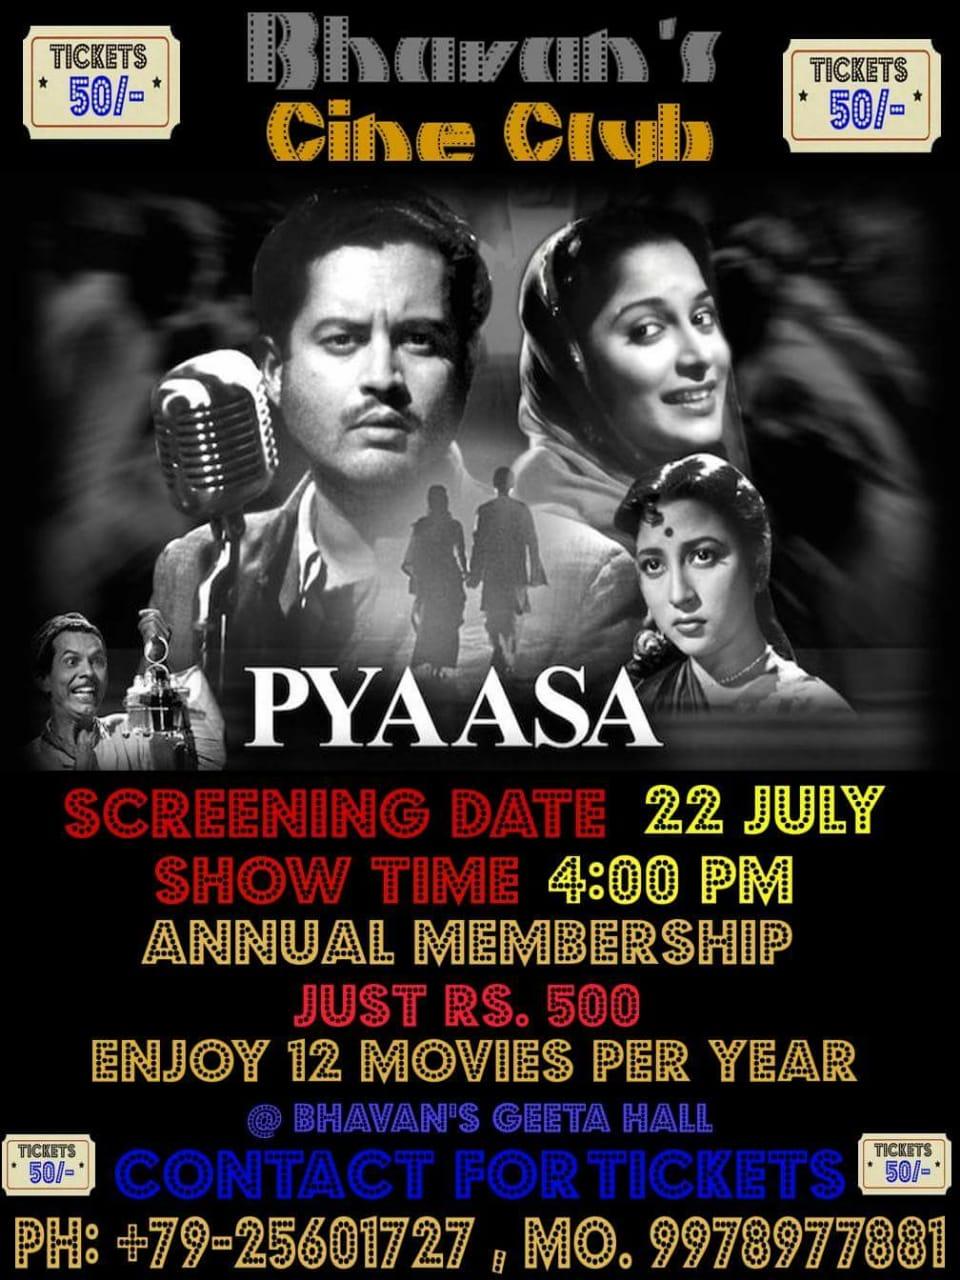 https://creativeyatra.com/wp-content/uploads/2018/07/Bhavans-Cine-Club-Pyaasa.jpeg